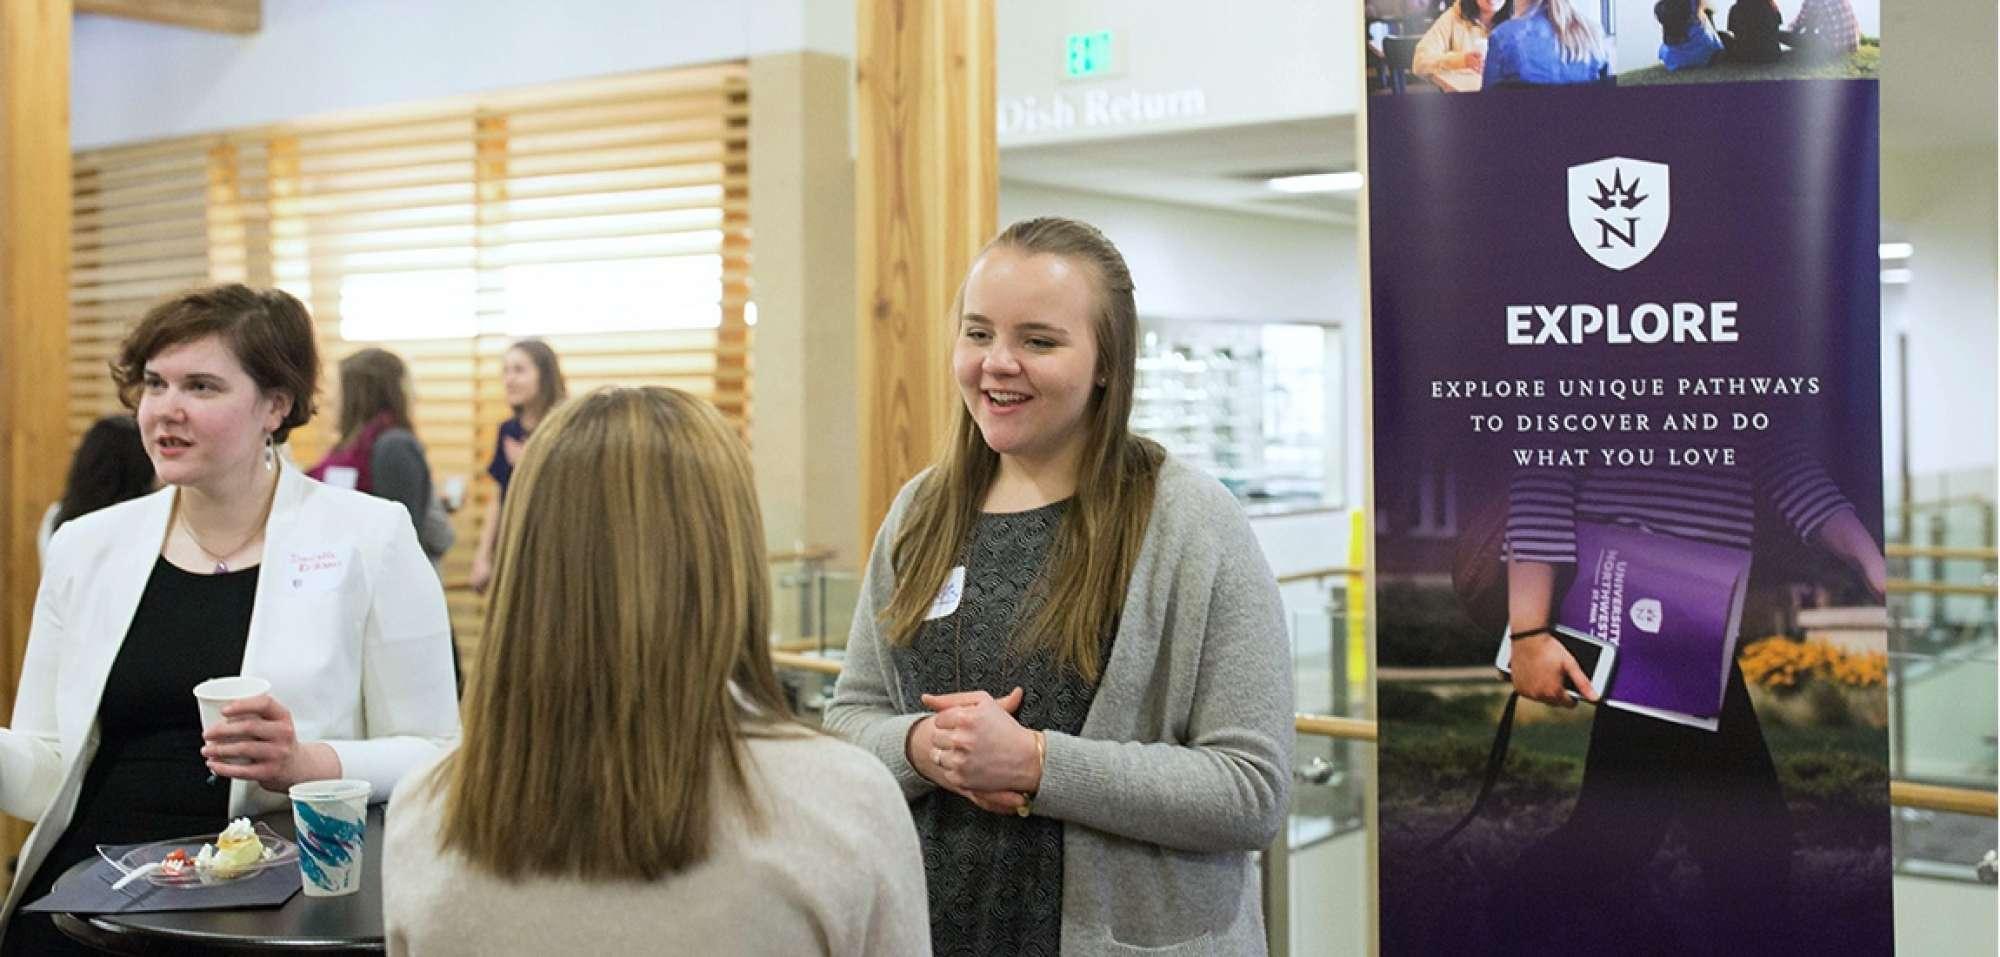 Career Development fair as Northwestern